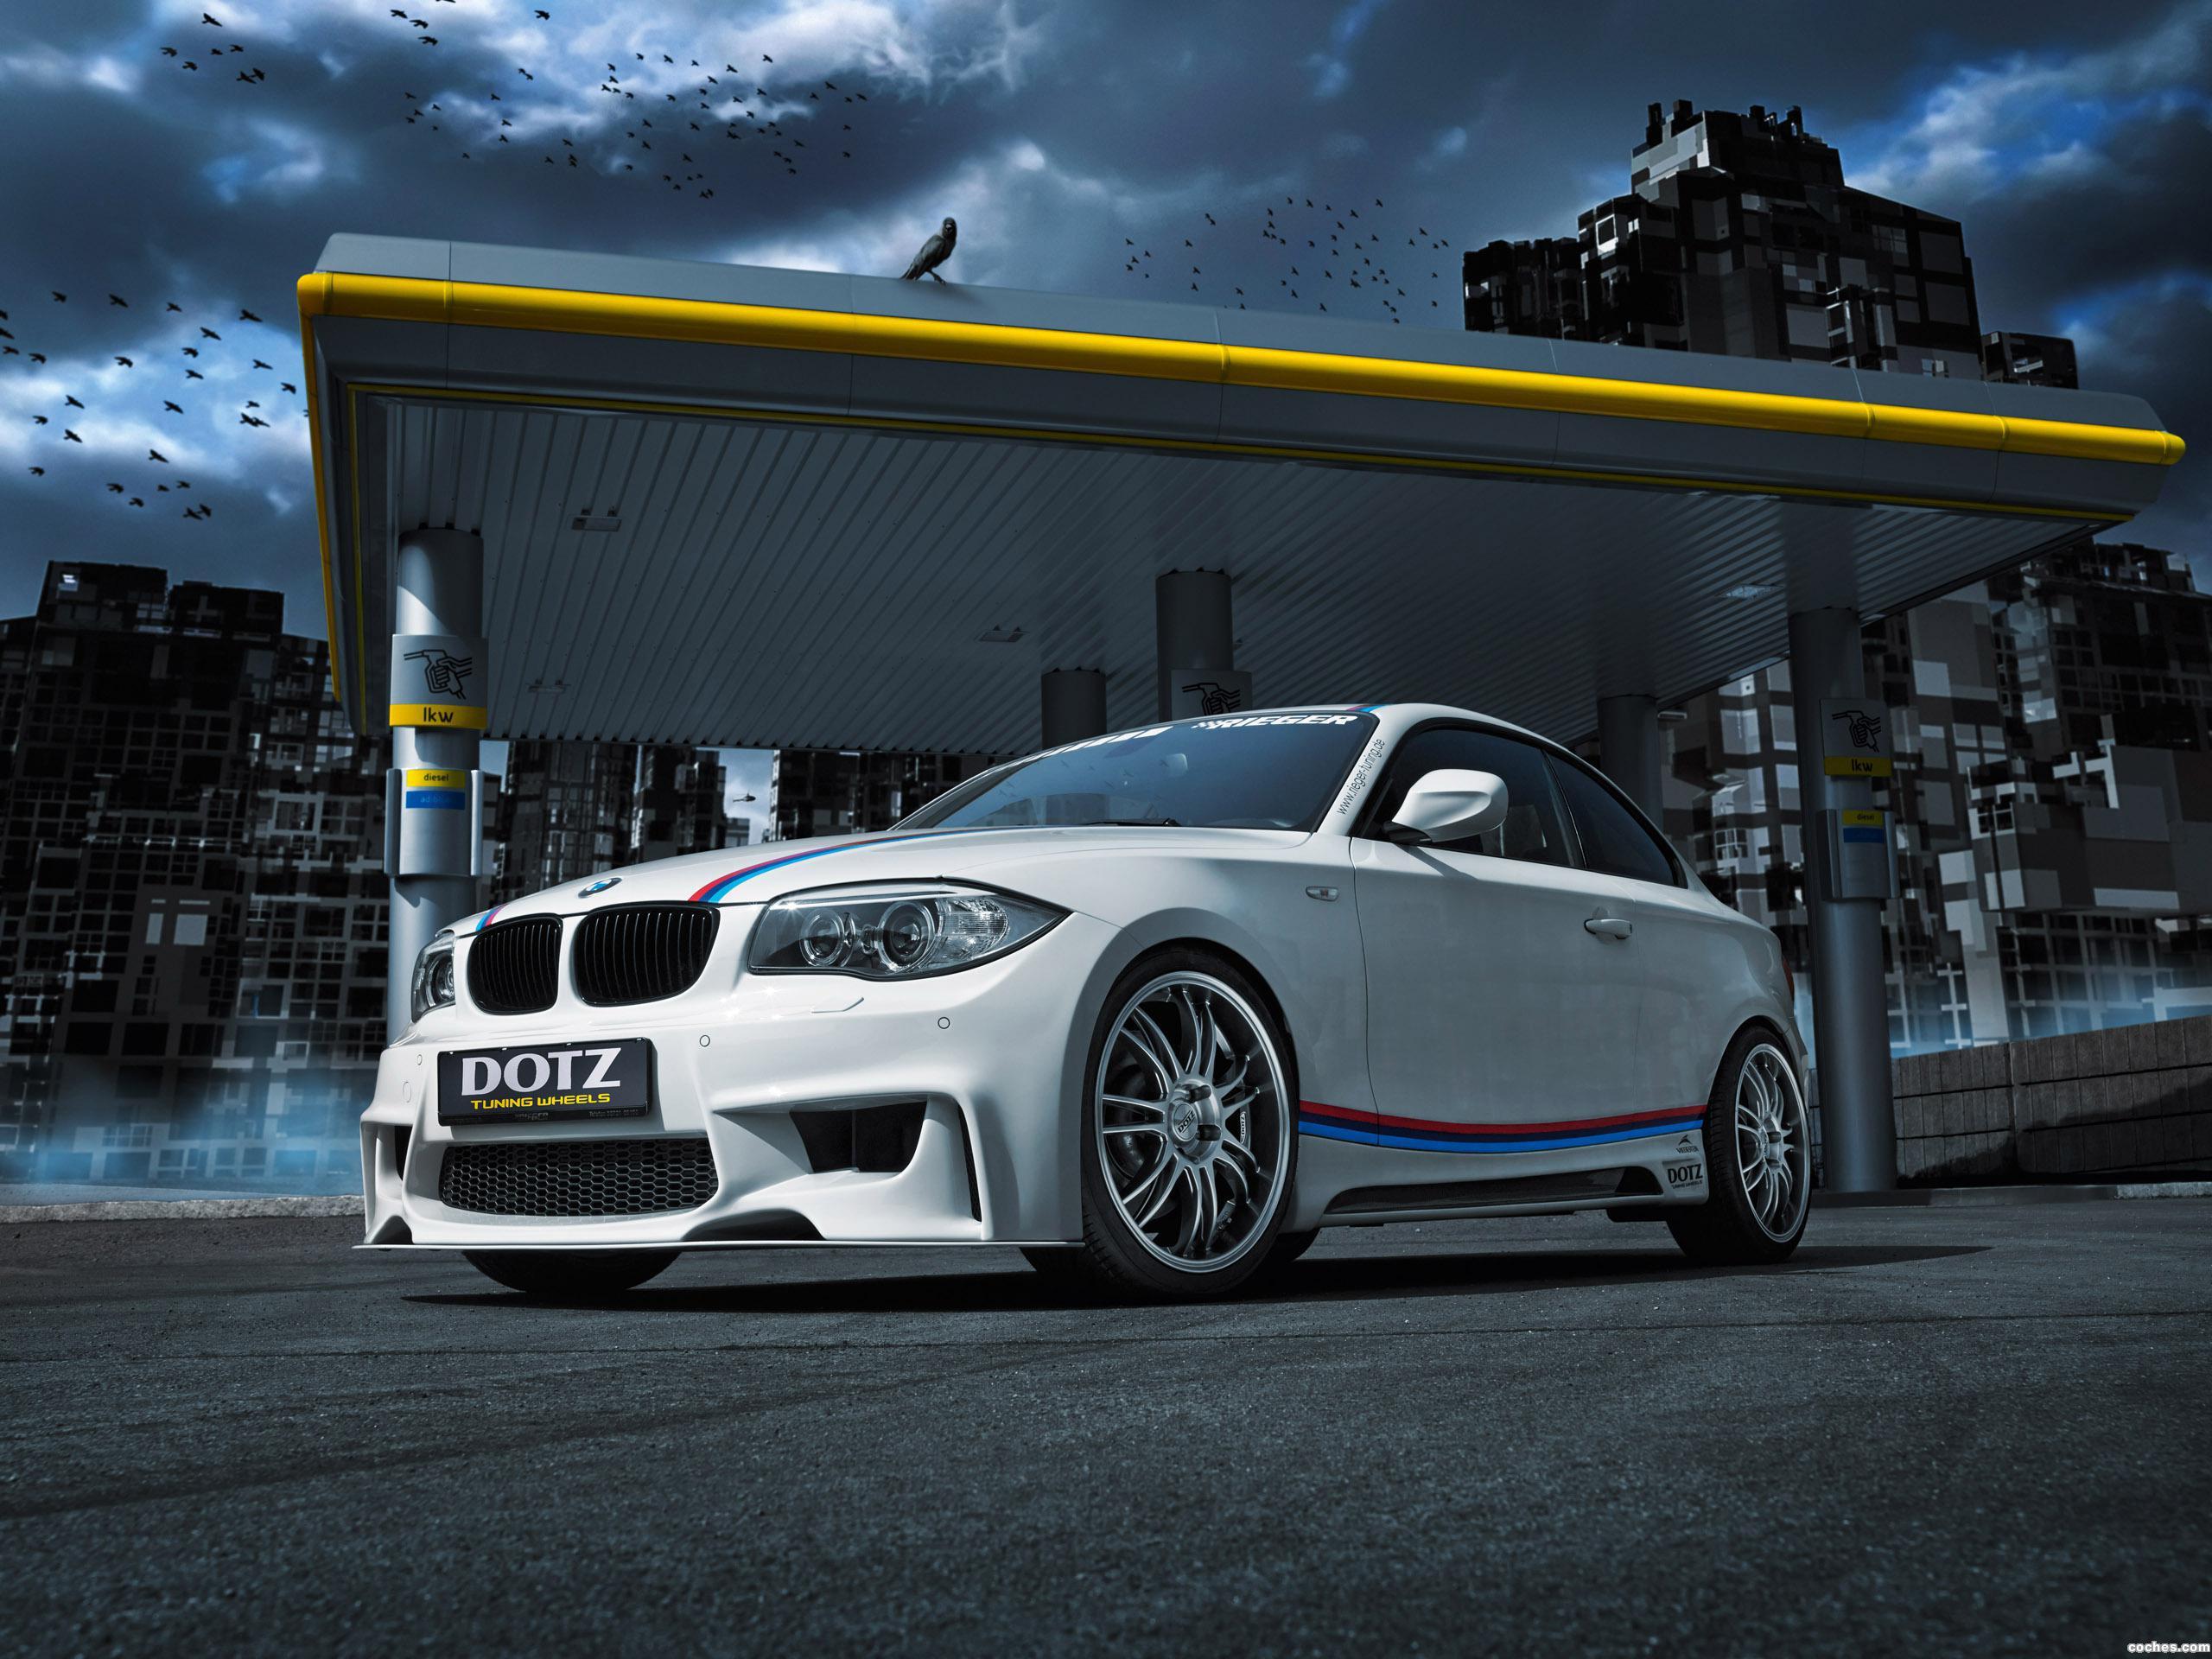 bmw_1-series-135i-coupe-dotz-shift-2014_r3